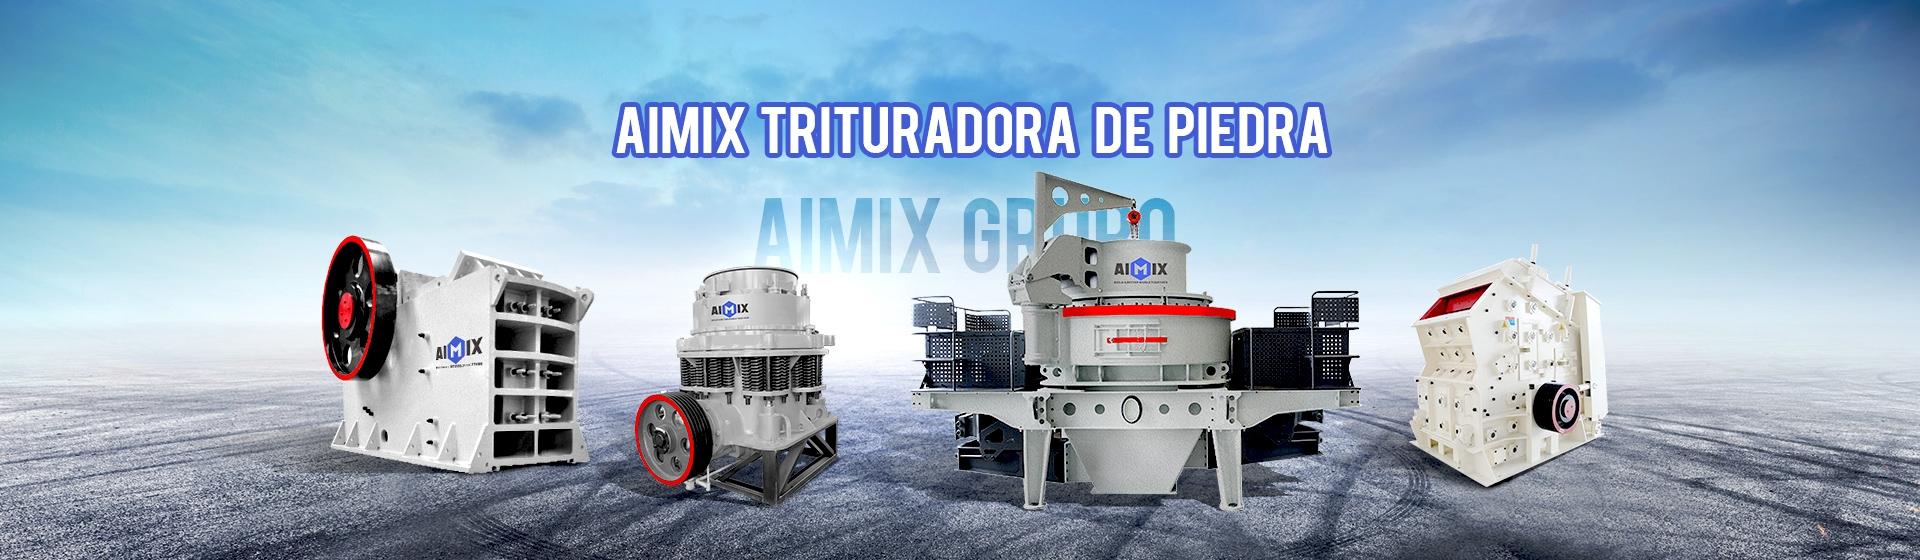 aimixtrituradora (@aimixtrituradora) Cover Image